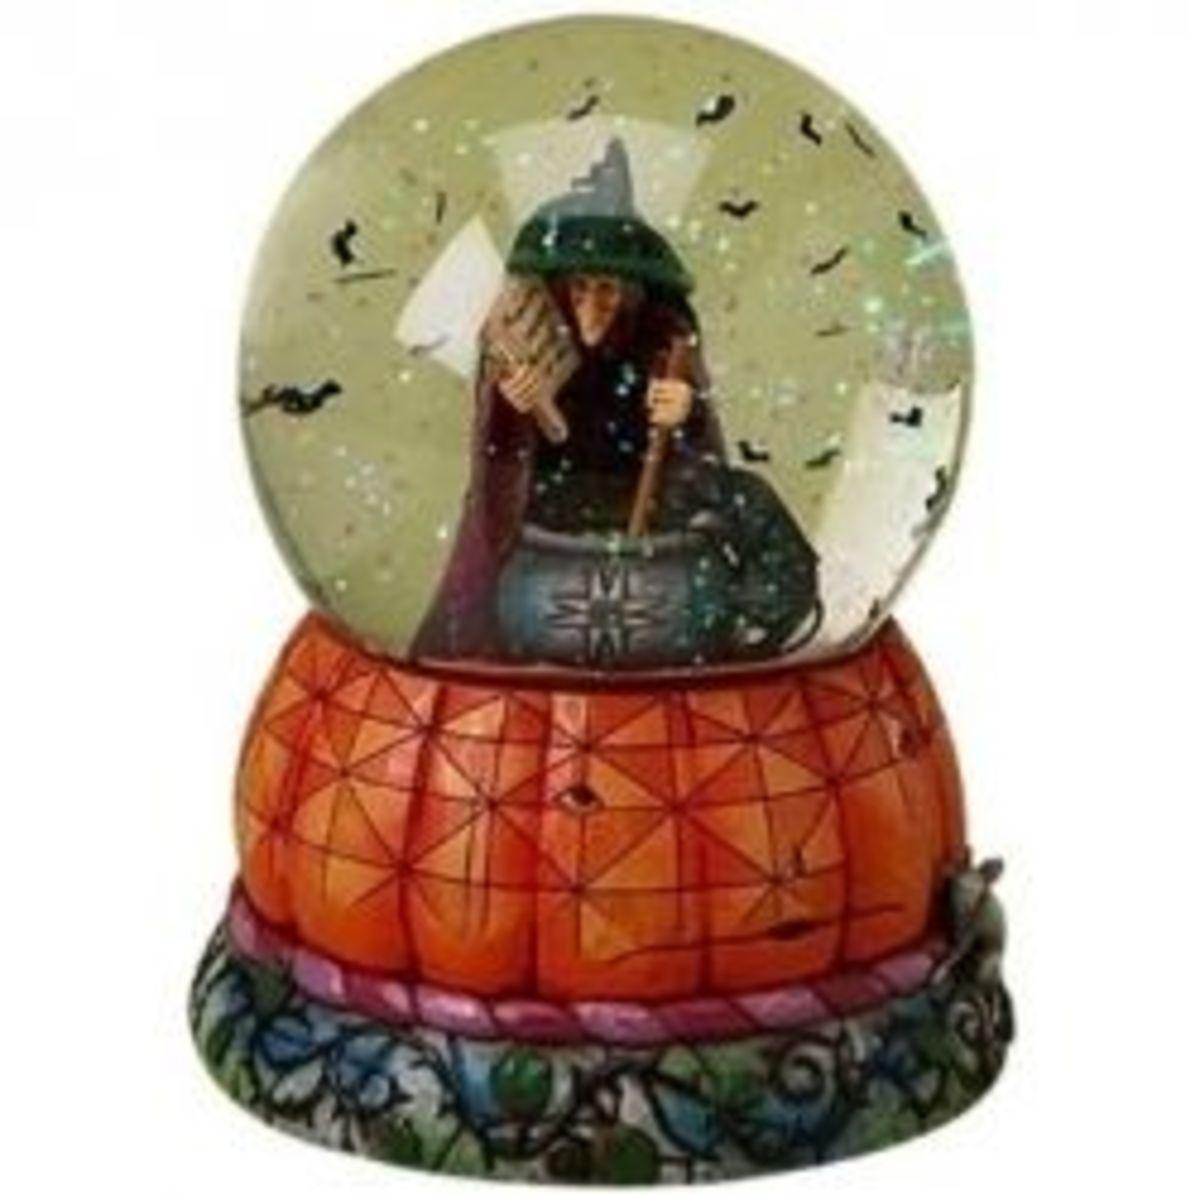 Halloween Snow Globes